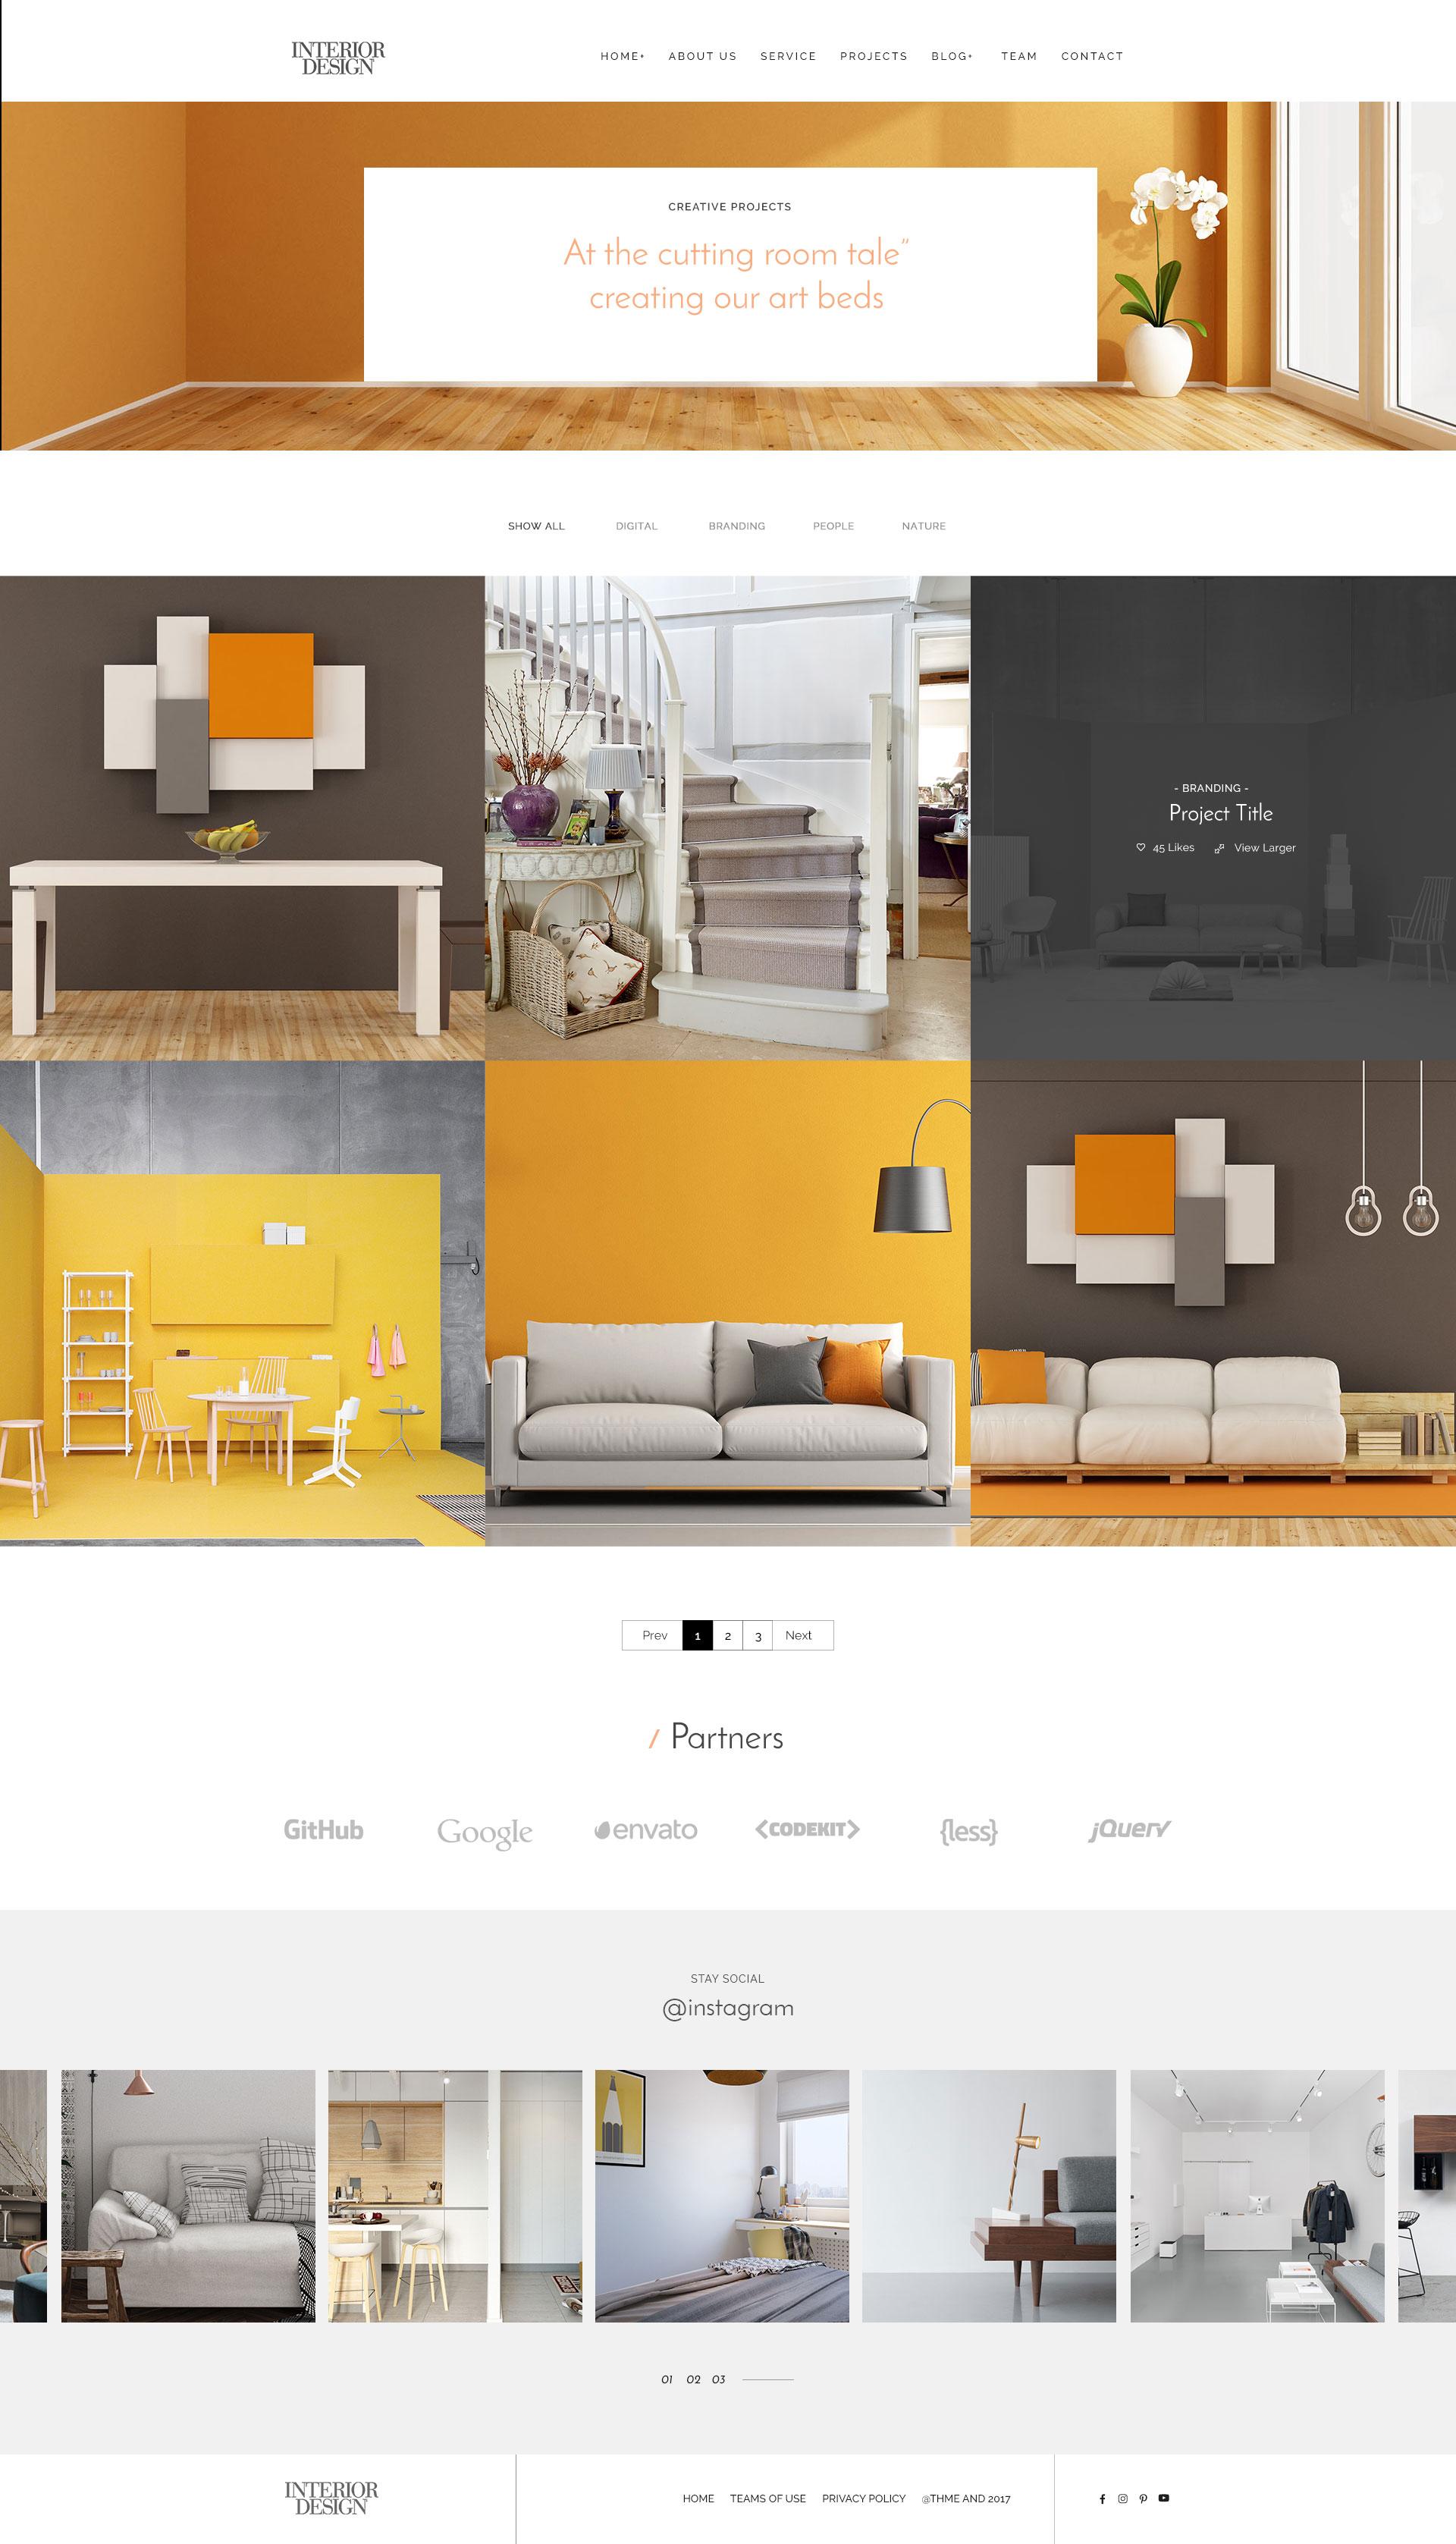 Interior design home projects - Interior Design Psd Template